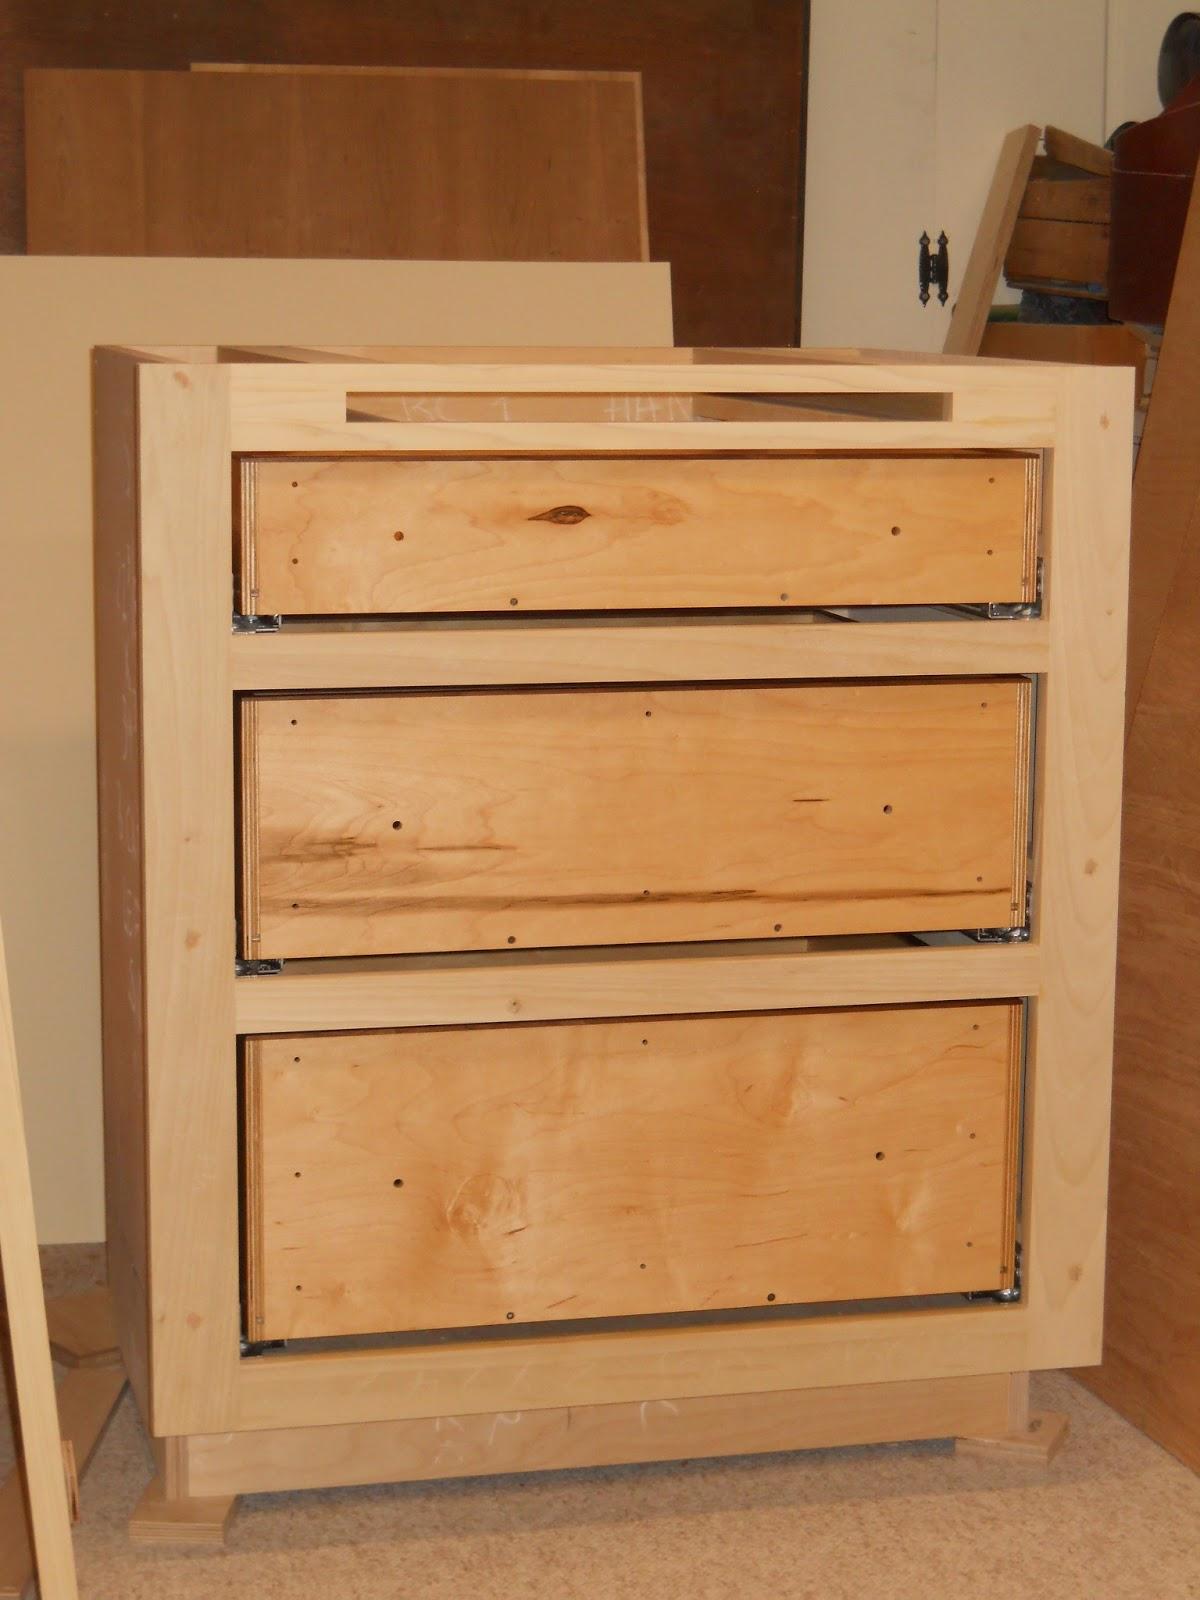 Making A Wall Cabinet Spit Vinegar Sink Wall Cabinet Update